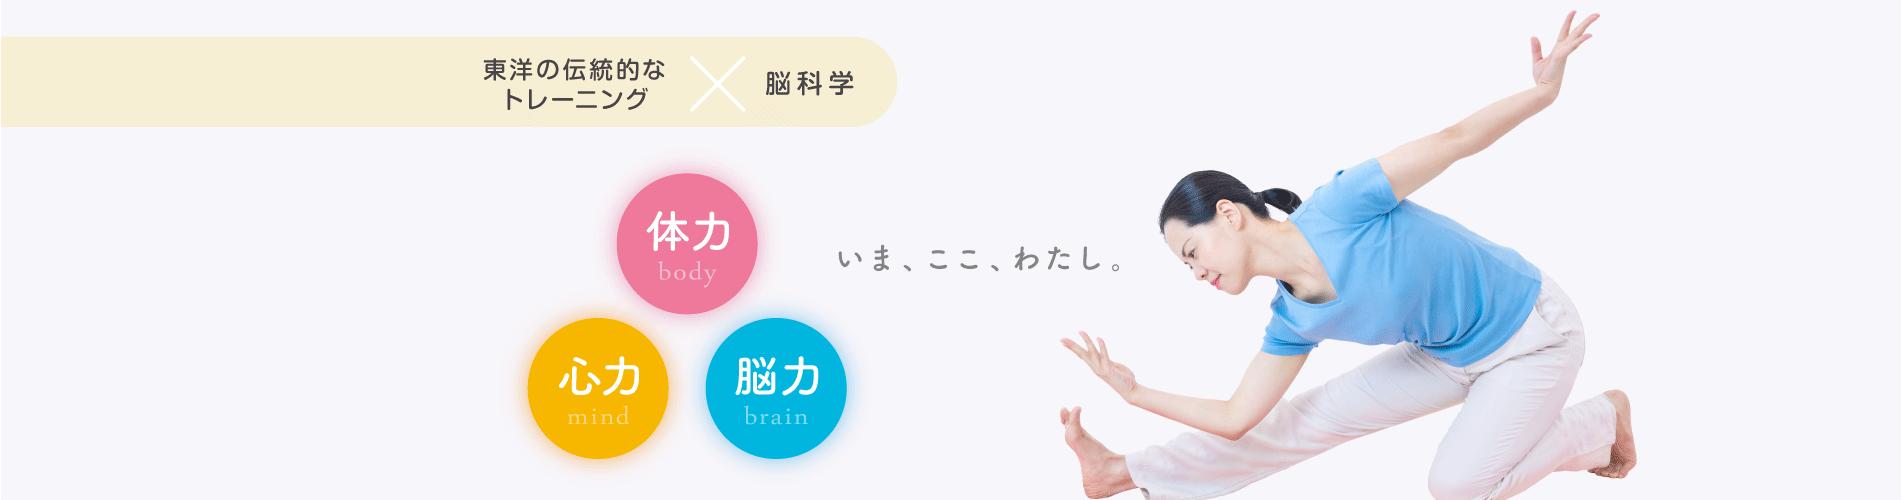 ILCHI Brain Yoga札幌スタジオの画像